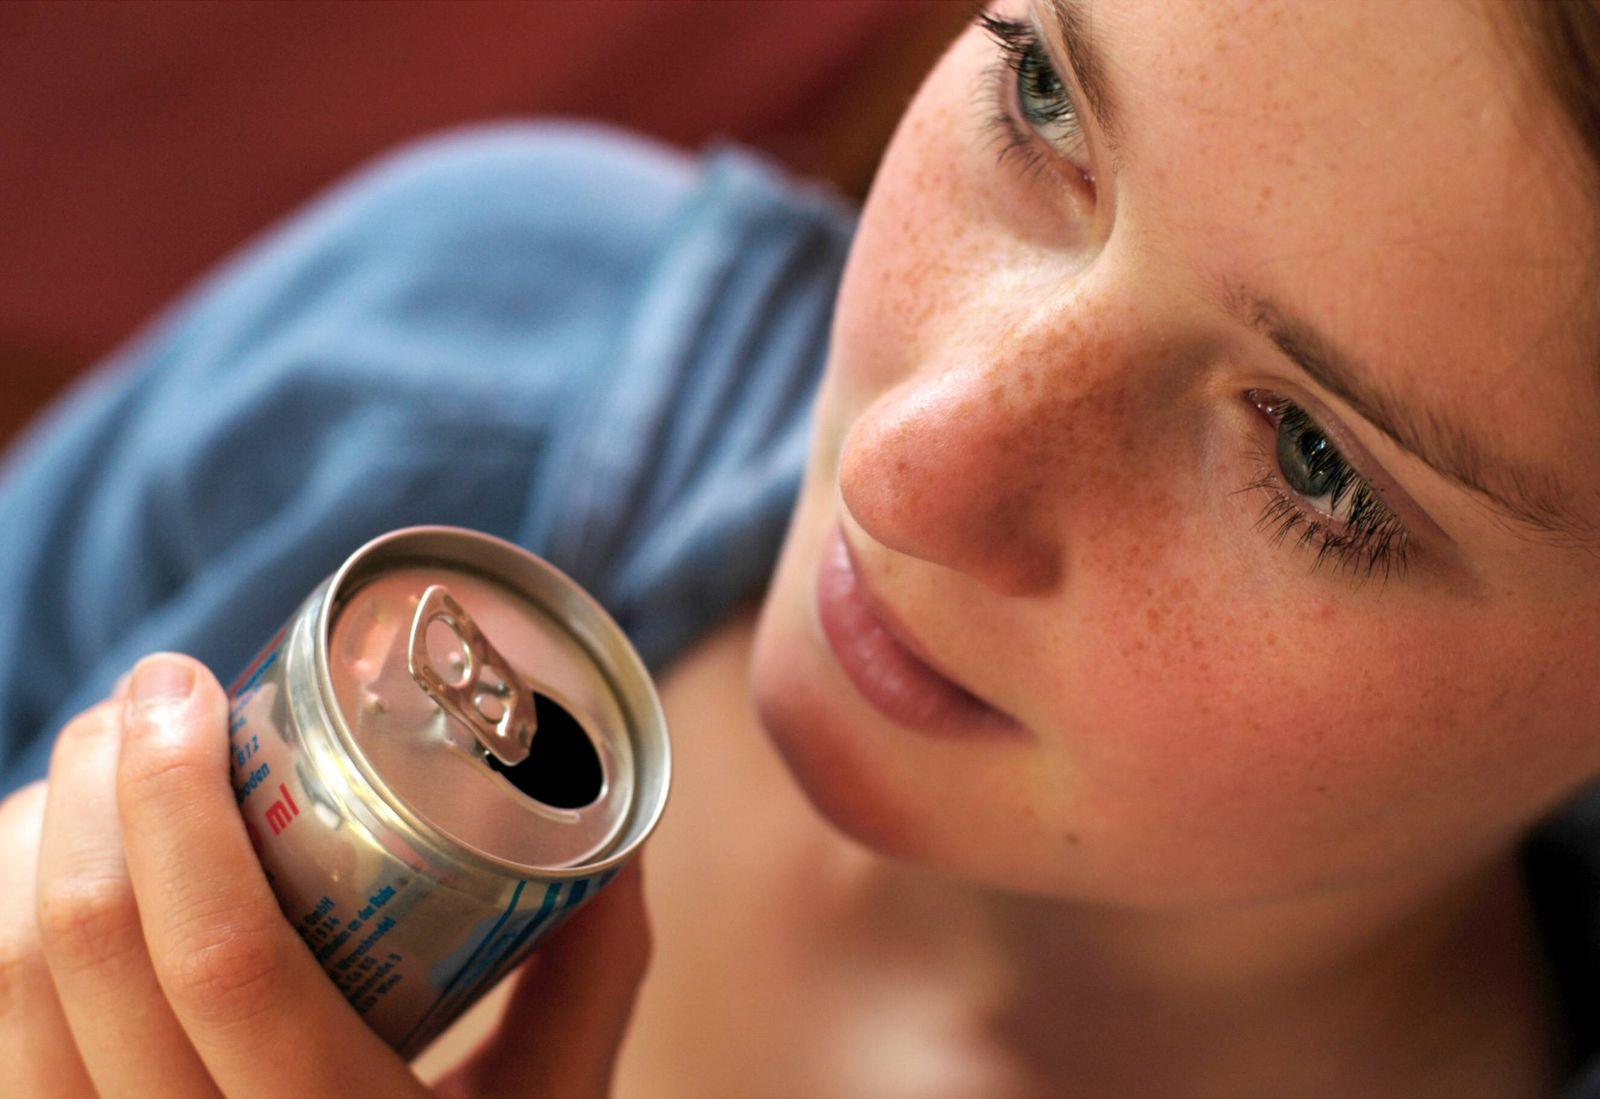 Thema Dosenpfand Getraenke Trinken Bonn 13 06 2003 MODEL RELEASE vorhanden MODEL RELEASED